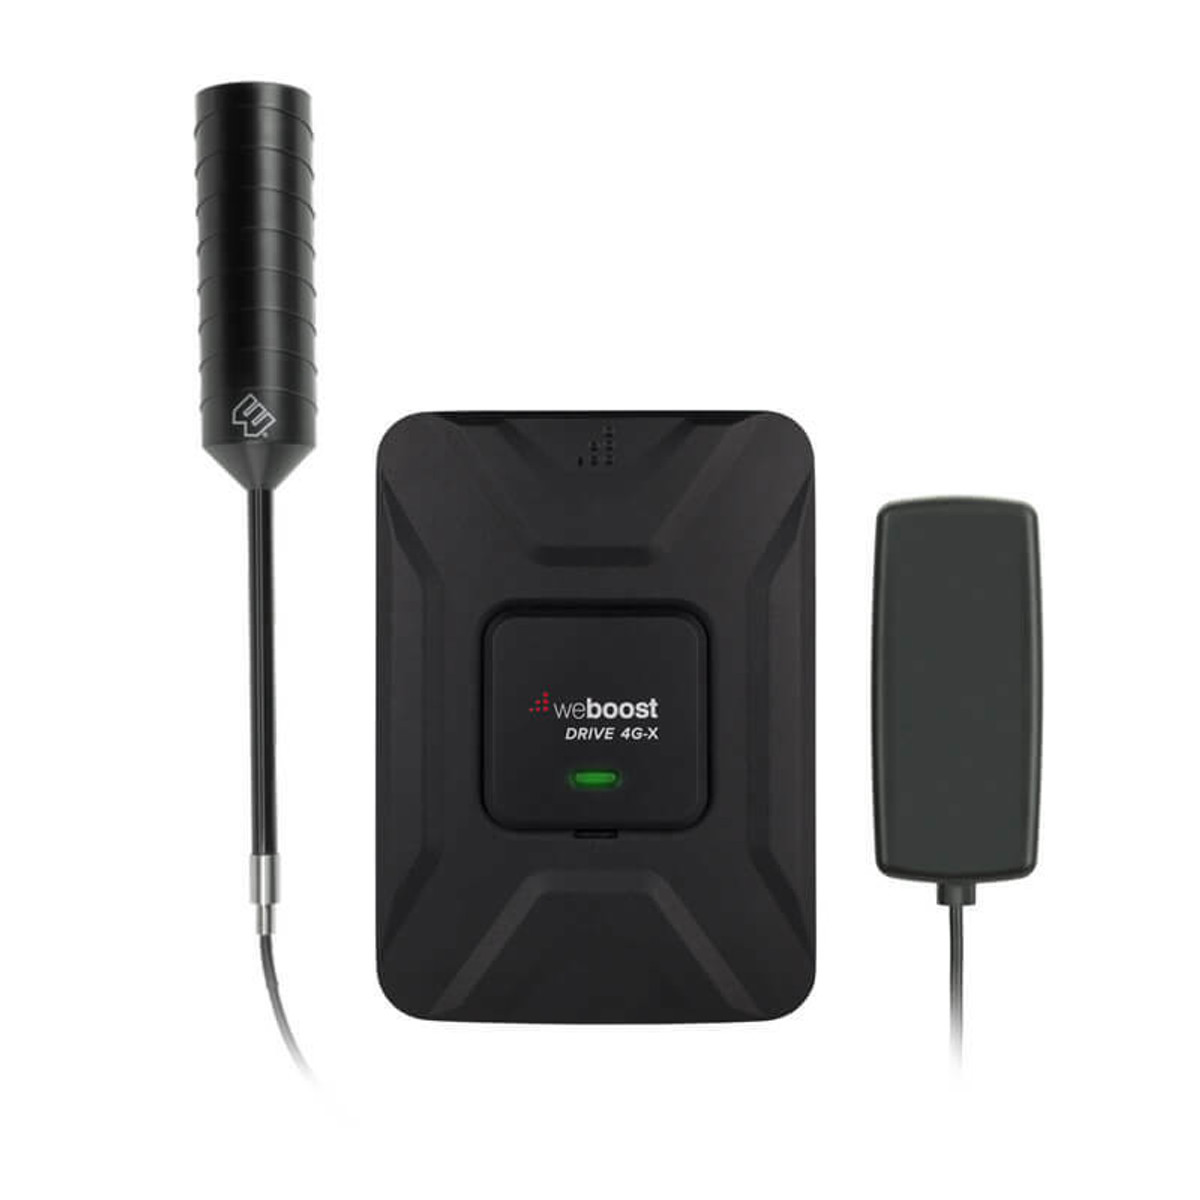 weBoost weBoost Drive 4G-X OTR Signal Booster Kit Truck Edition, Refurbished or 470210R